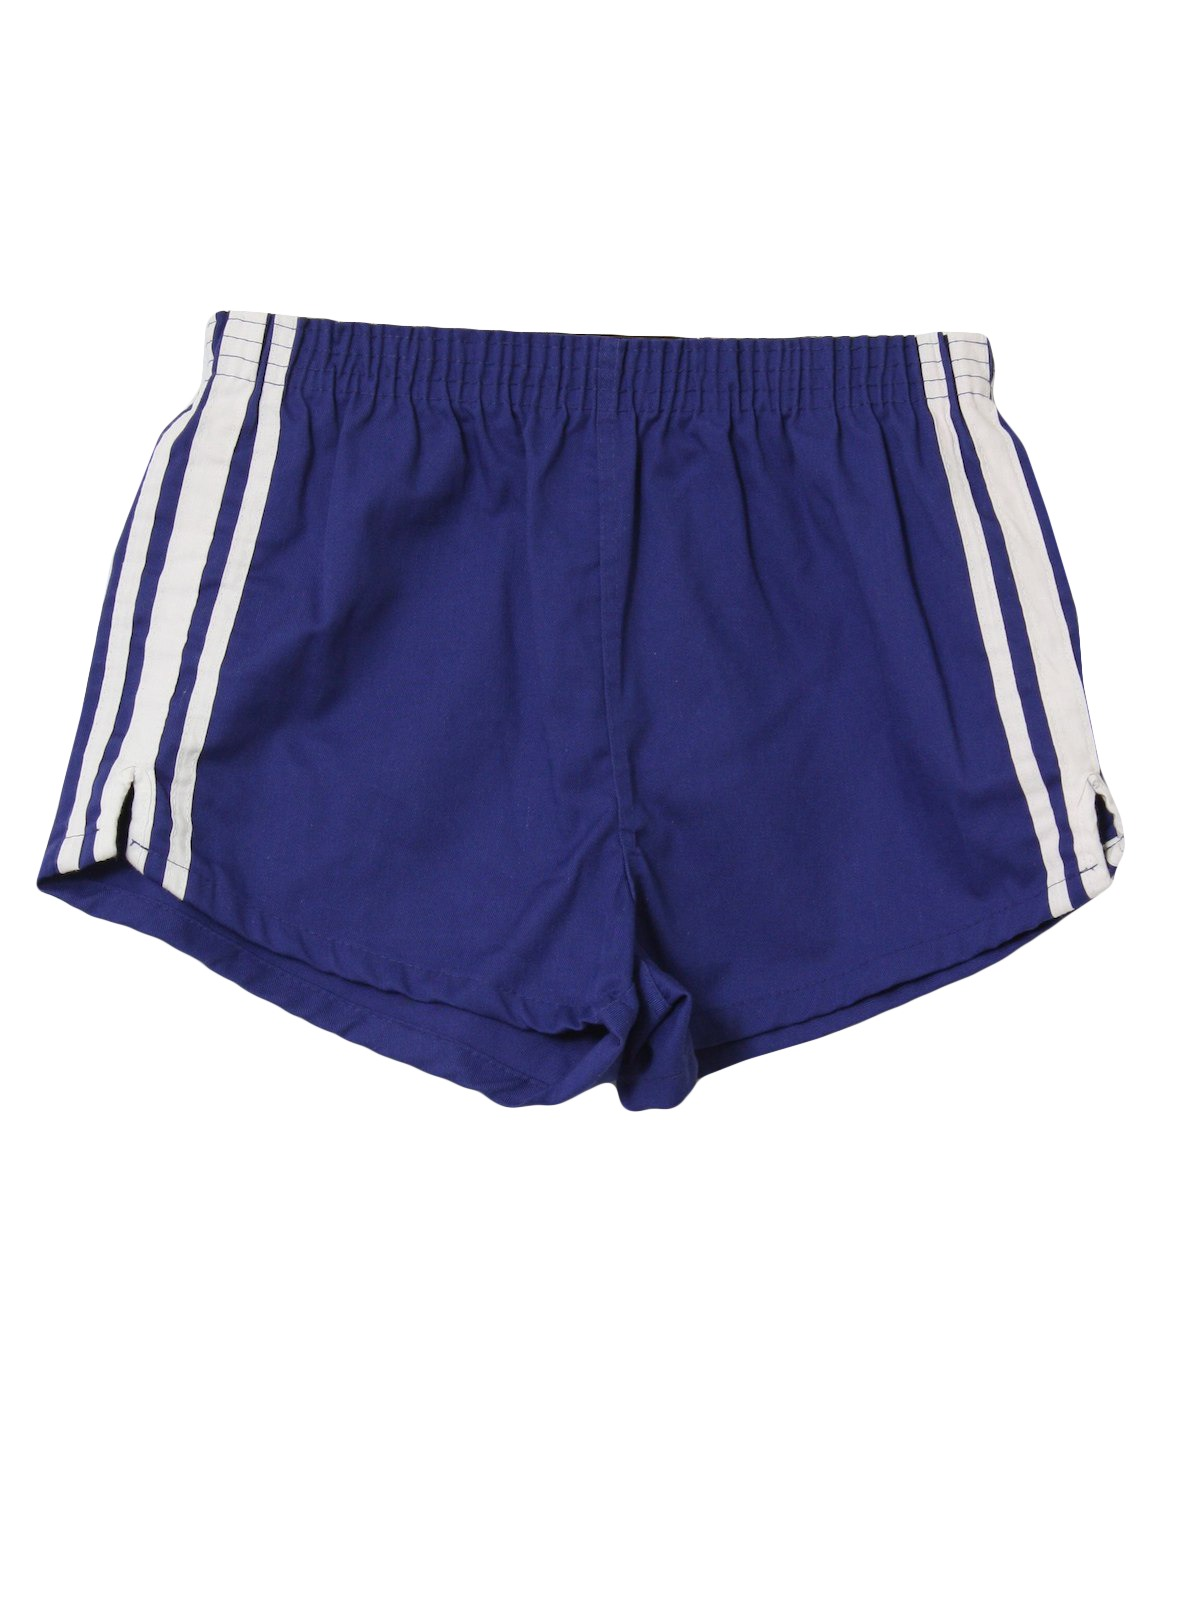 1980 S Retro Shorts 80s Athletic Shorts Mens Blue